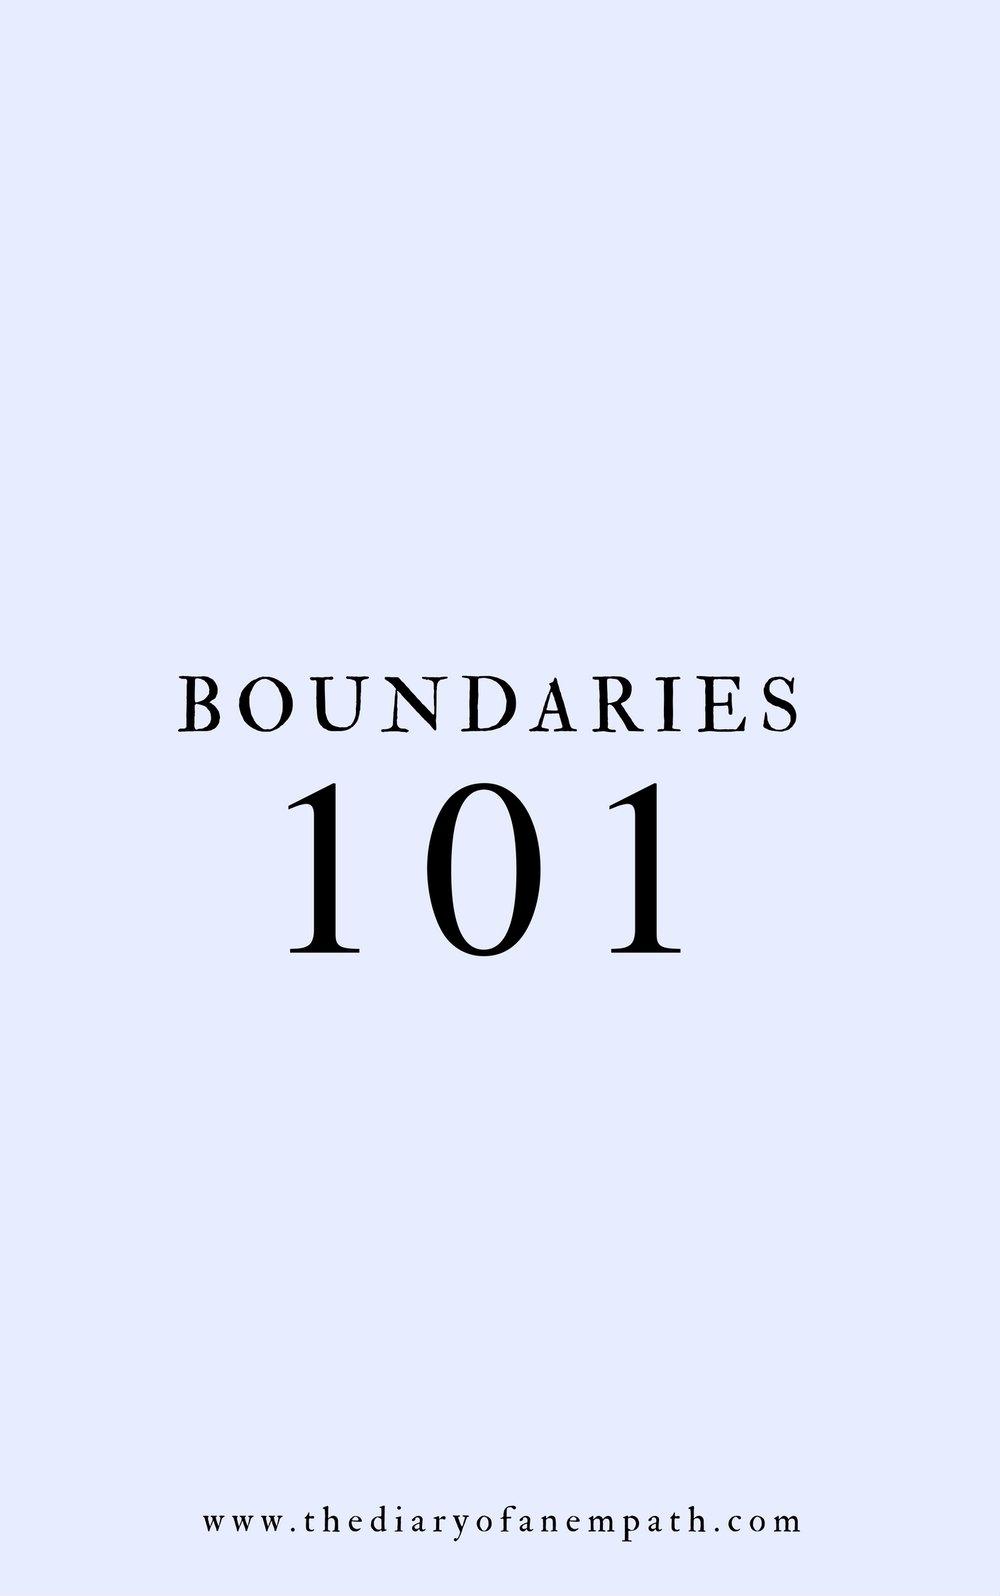 how to set boundaries, thediaryofanempath.com